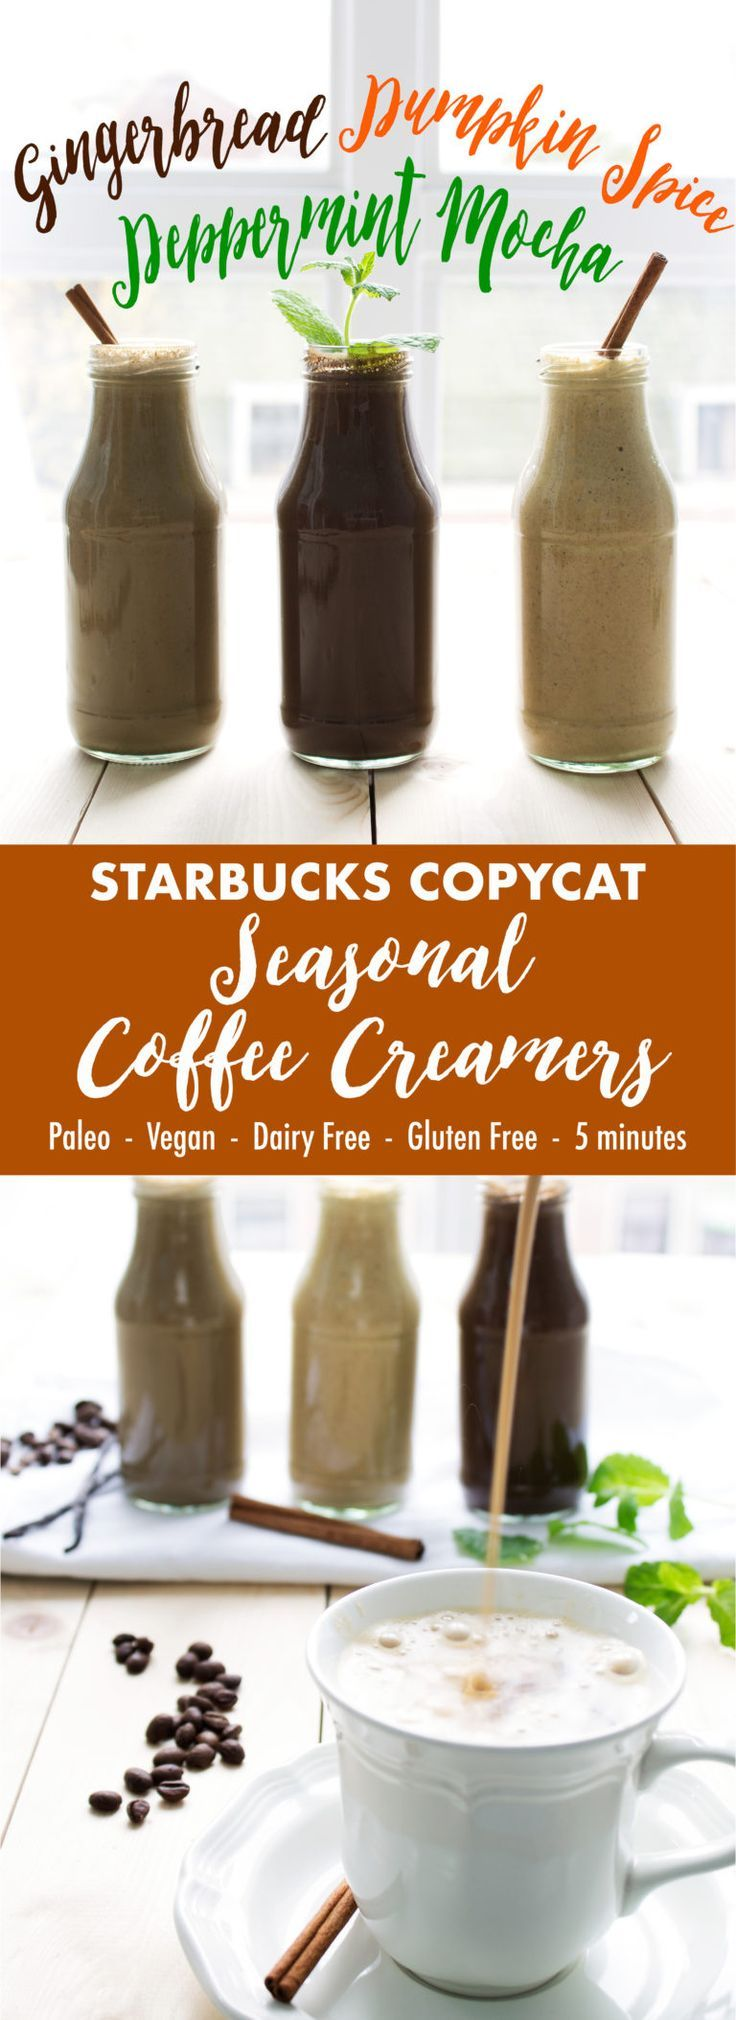 34+ Vegan christmas coffee starbucks ideas